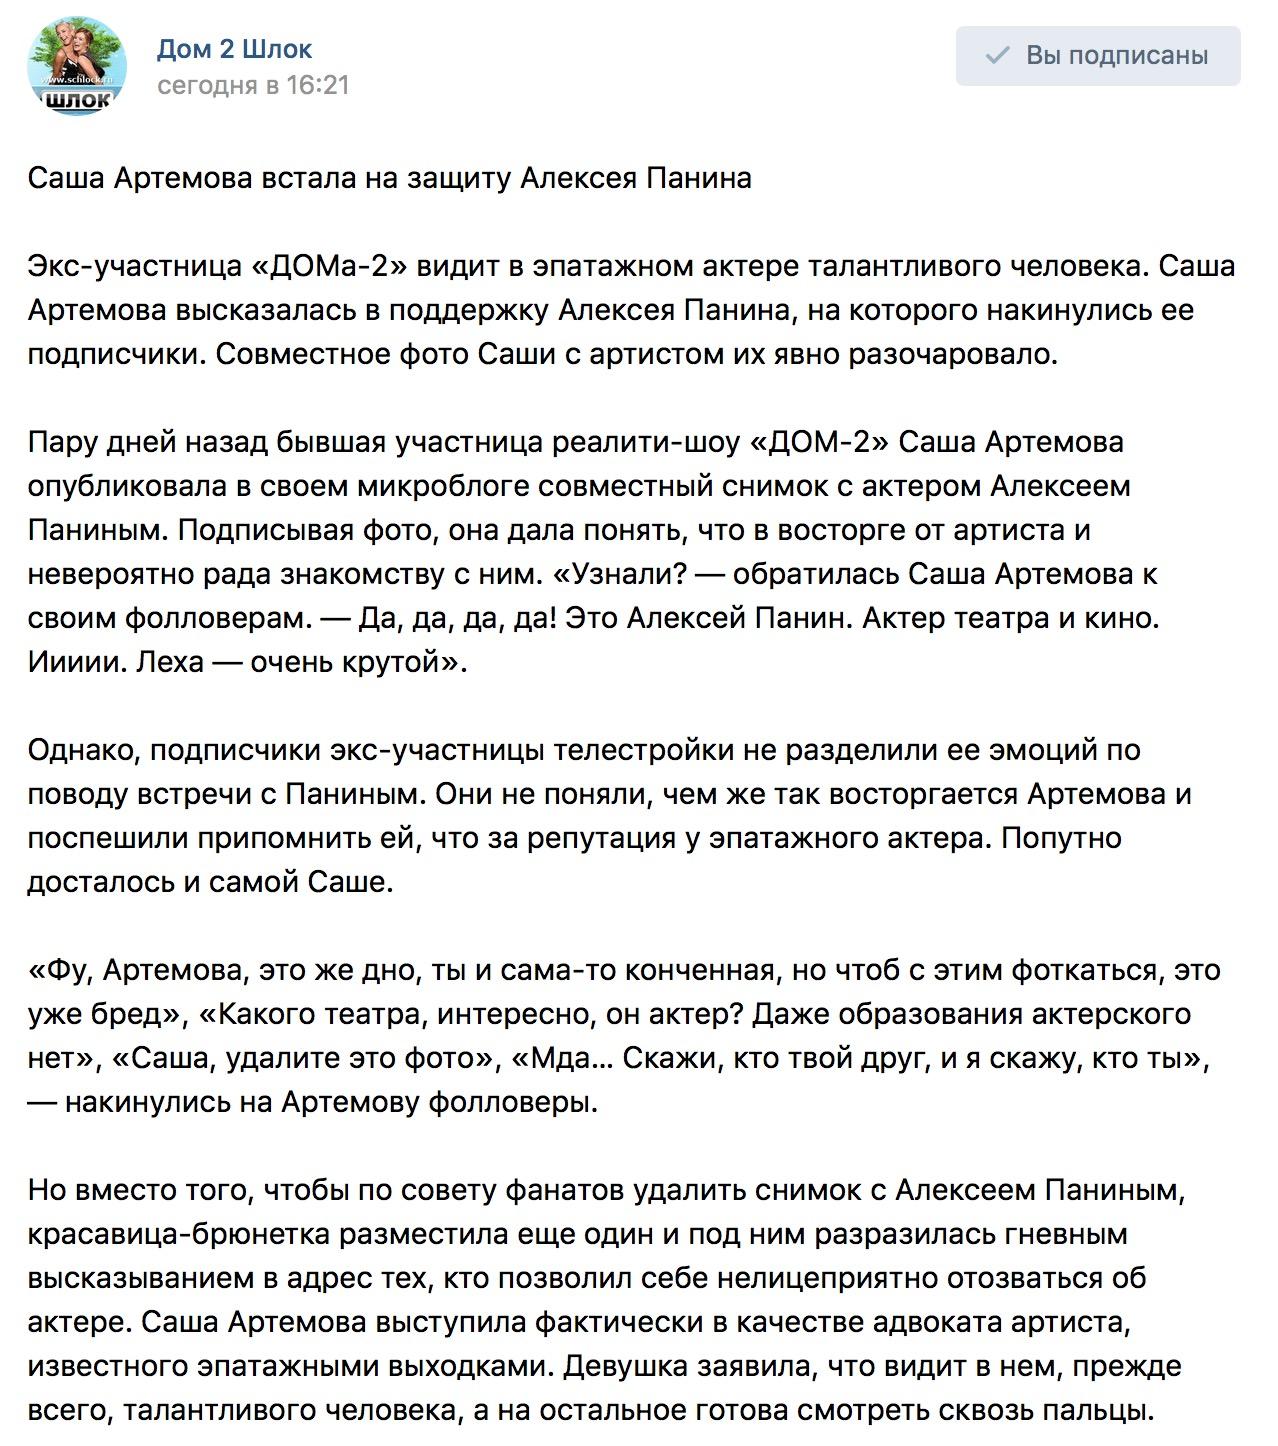 Саша Артемова встала на защиту Алексея Панина